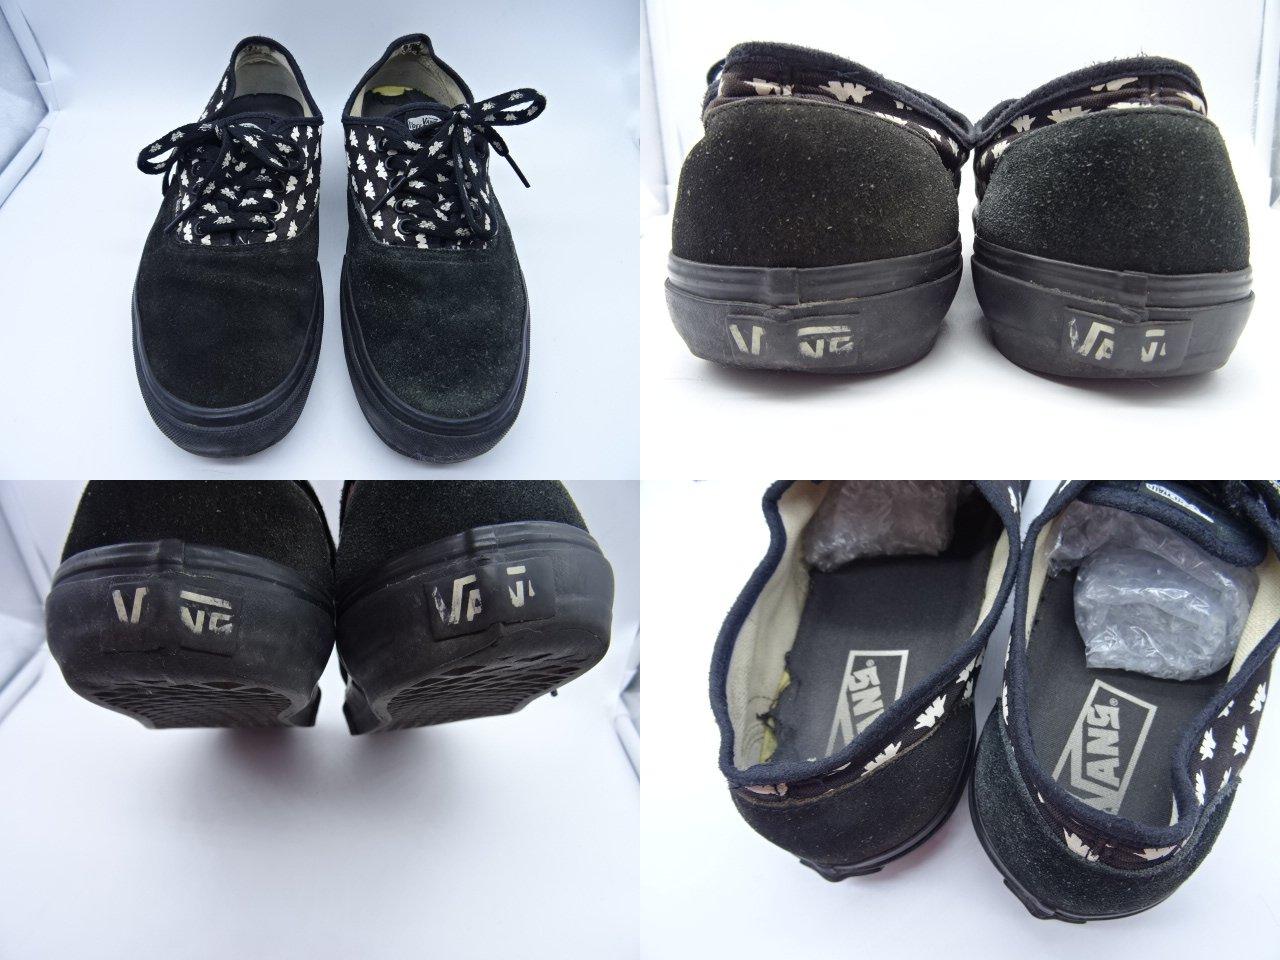 WTAPS 06aw VANS AUTHENTIC S サイズ27.5 SYNDICATE シンジケート スニーカー シューズ 靴 大名店【中古】